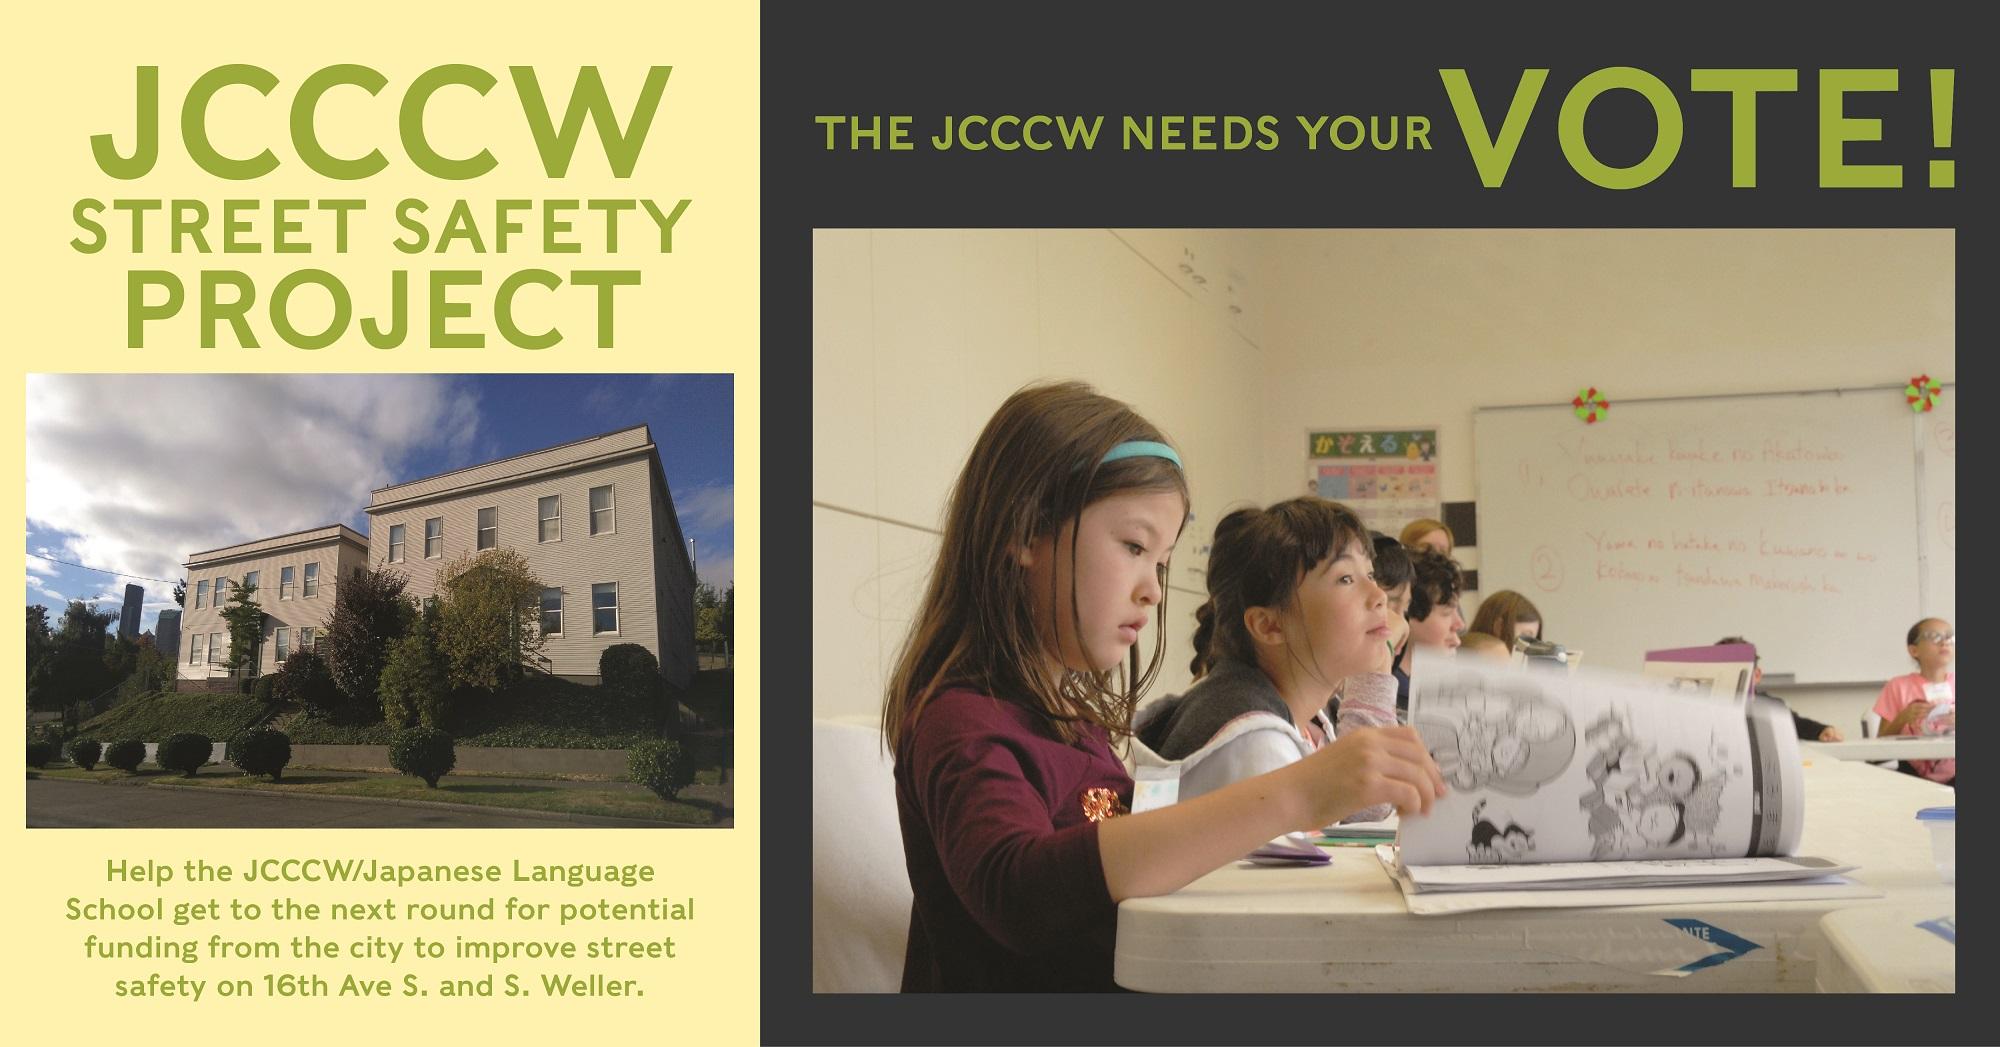 JCCCWstreetsafety-01.jpg